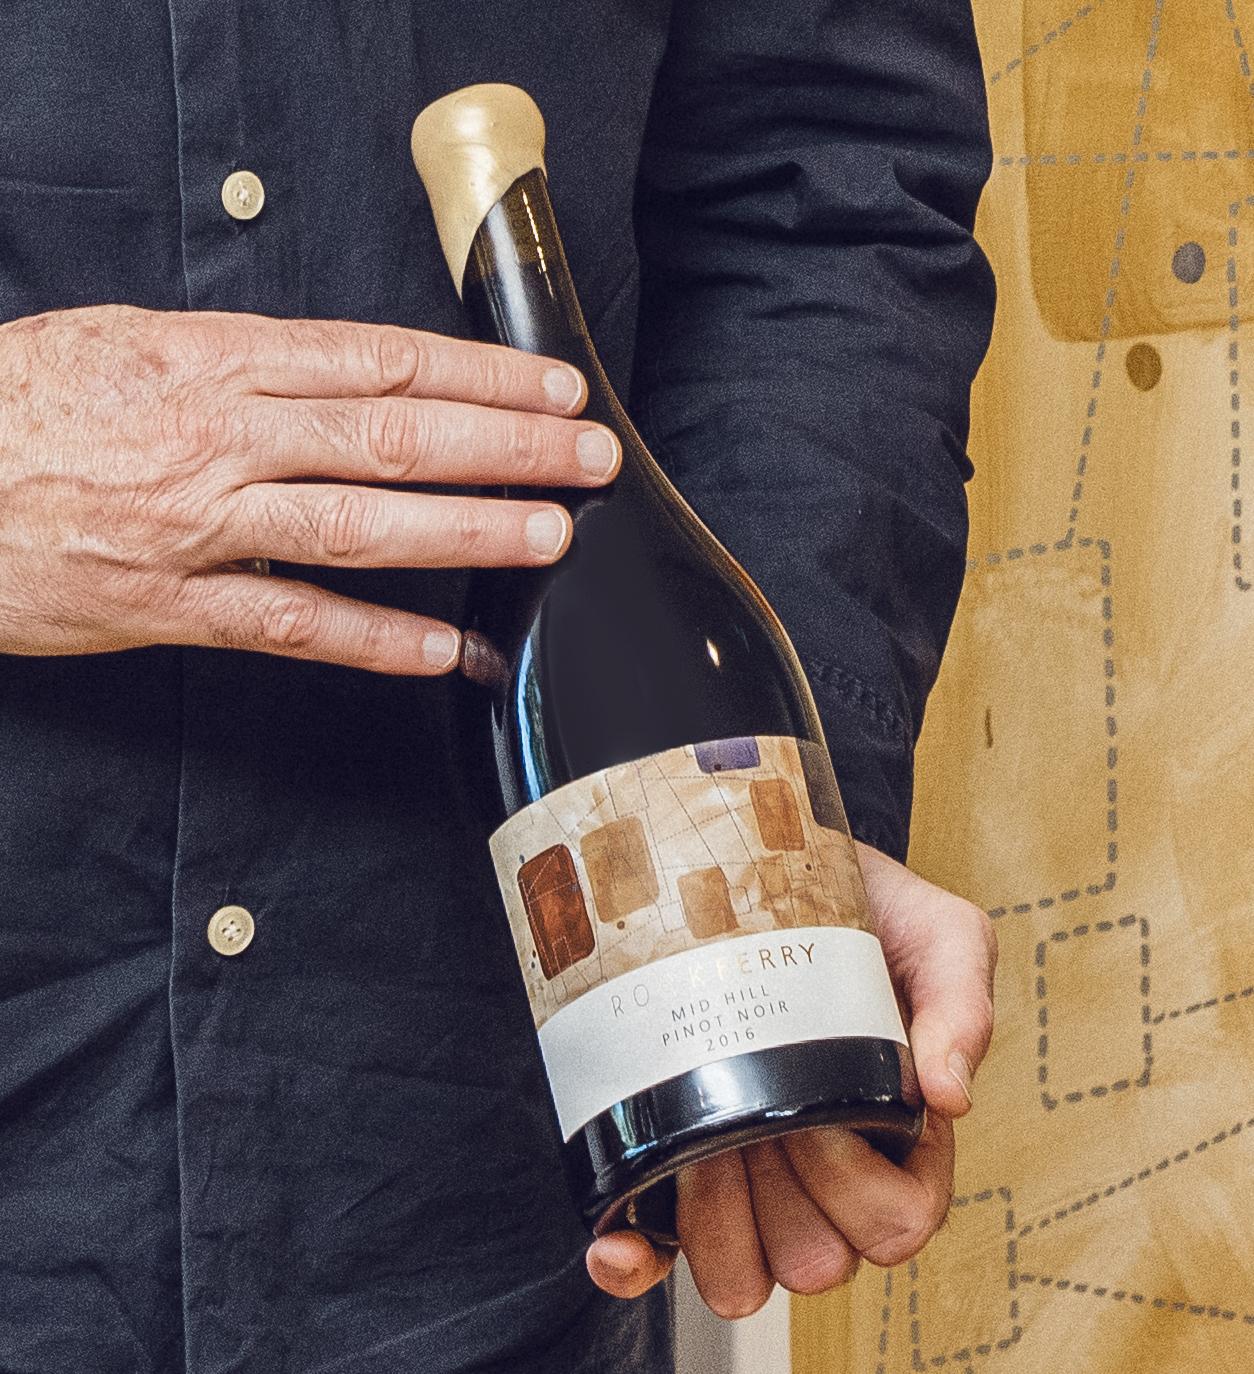 """From their Bendigo vineyards this chosen rows and rare bottling has distinctive, ripe and concentrated aromas of dried raspberry, dark plum and ripe dark cherry flesh."" - Cameron Douglas"